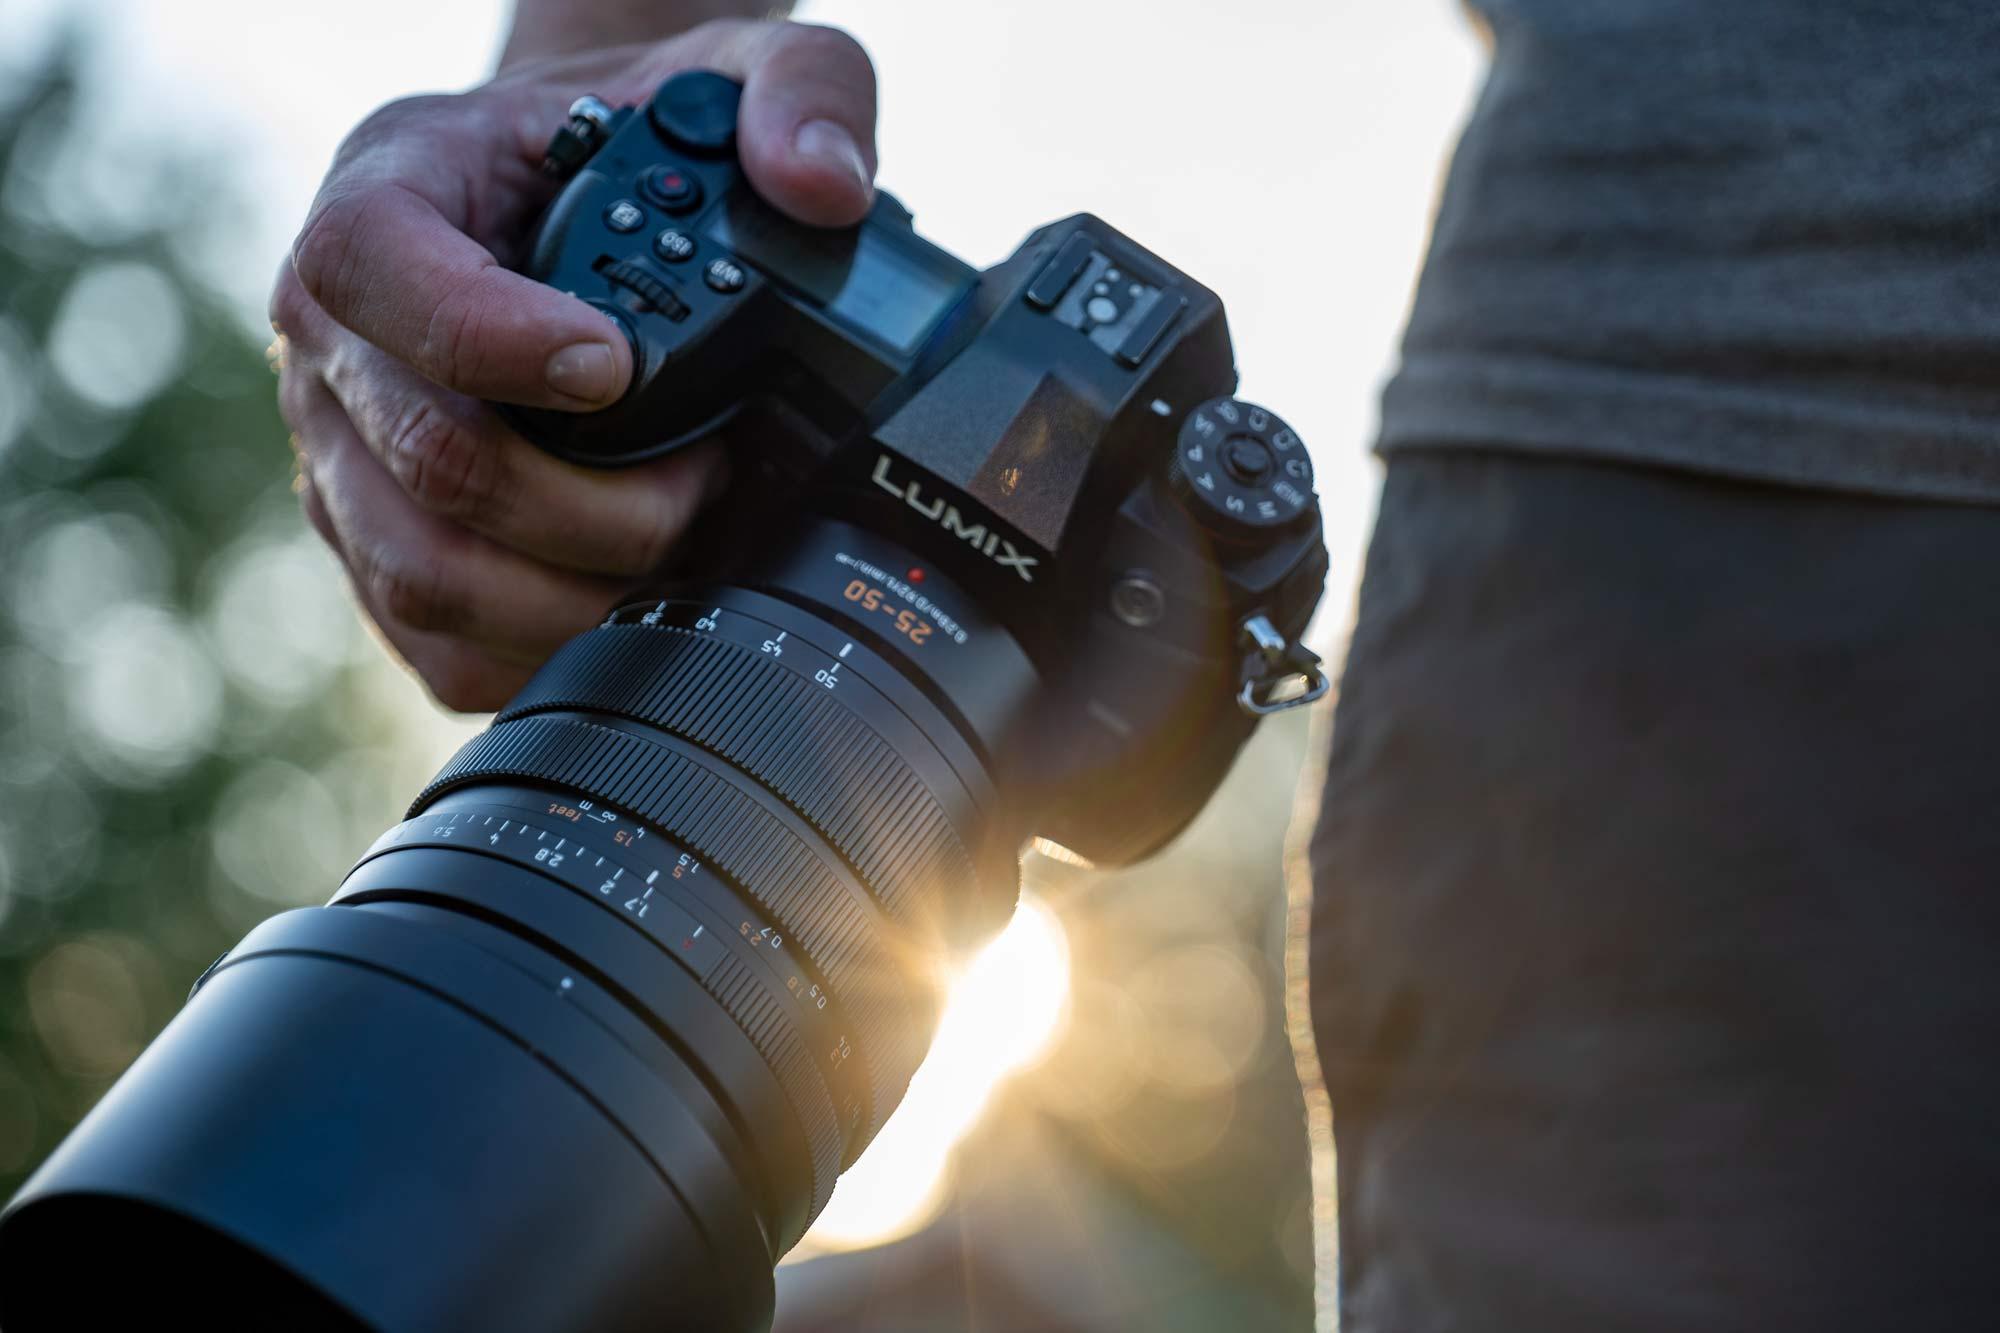 Panasonic Leica 25-50mm f/1.7 Zoomobjektiv